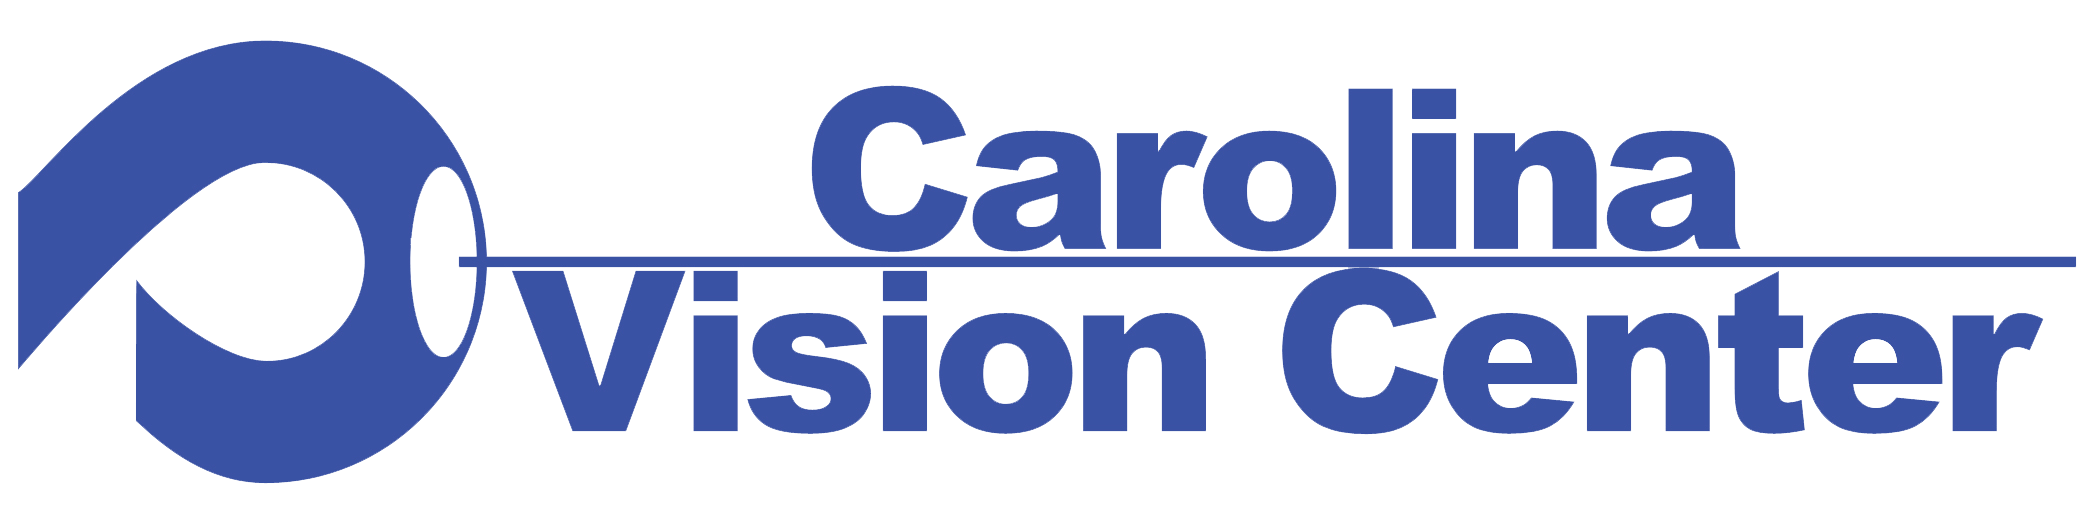 Carolina Vision Center